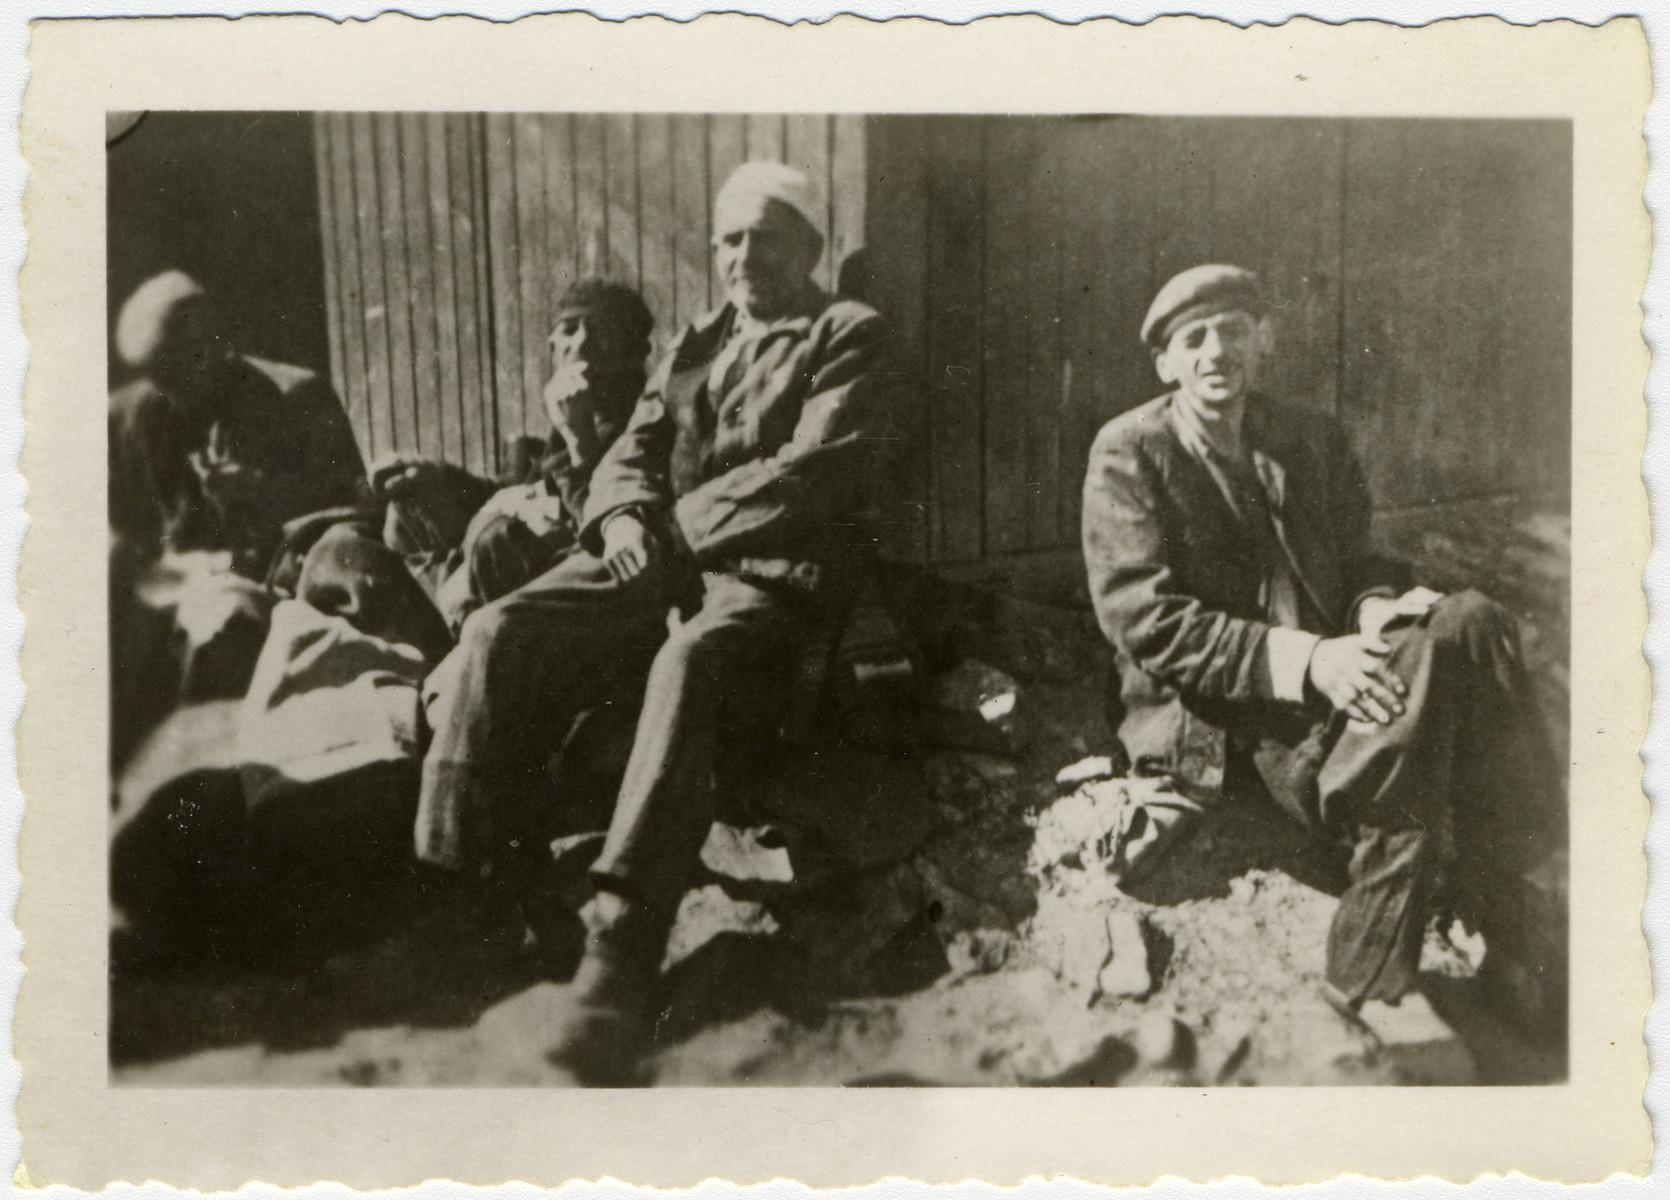 Four survivors rest outside a barracks in the Dachau concentration camp.